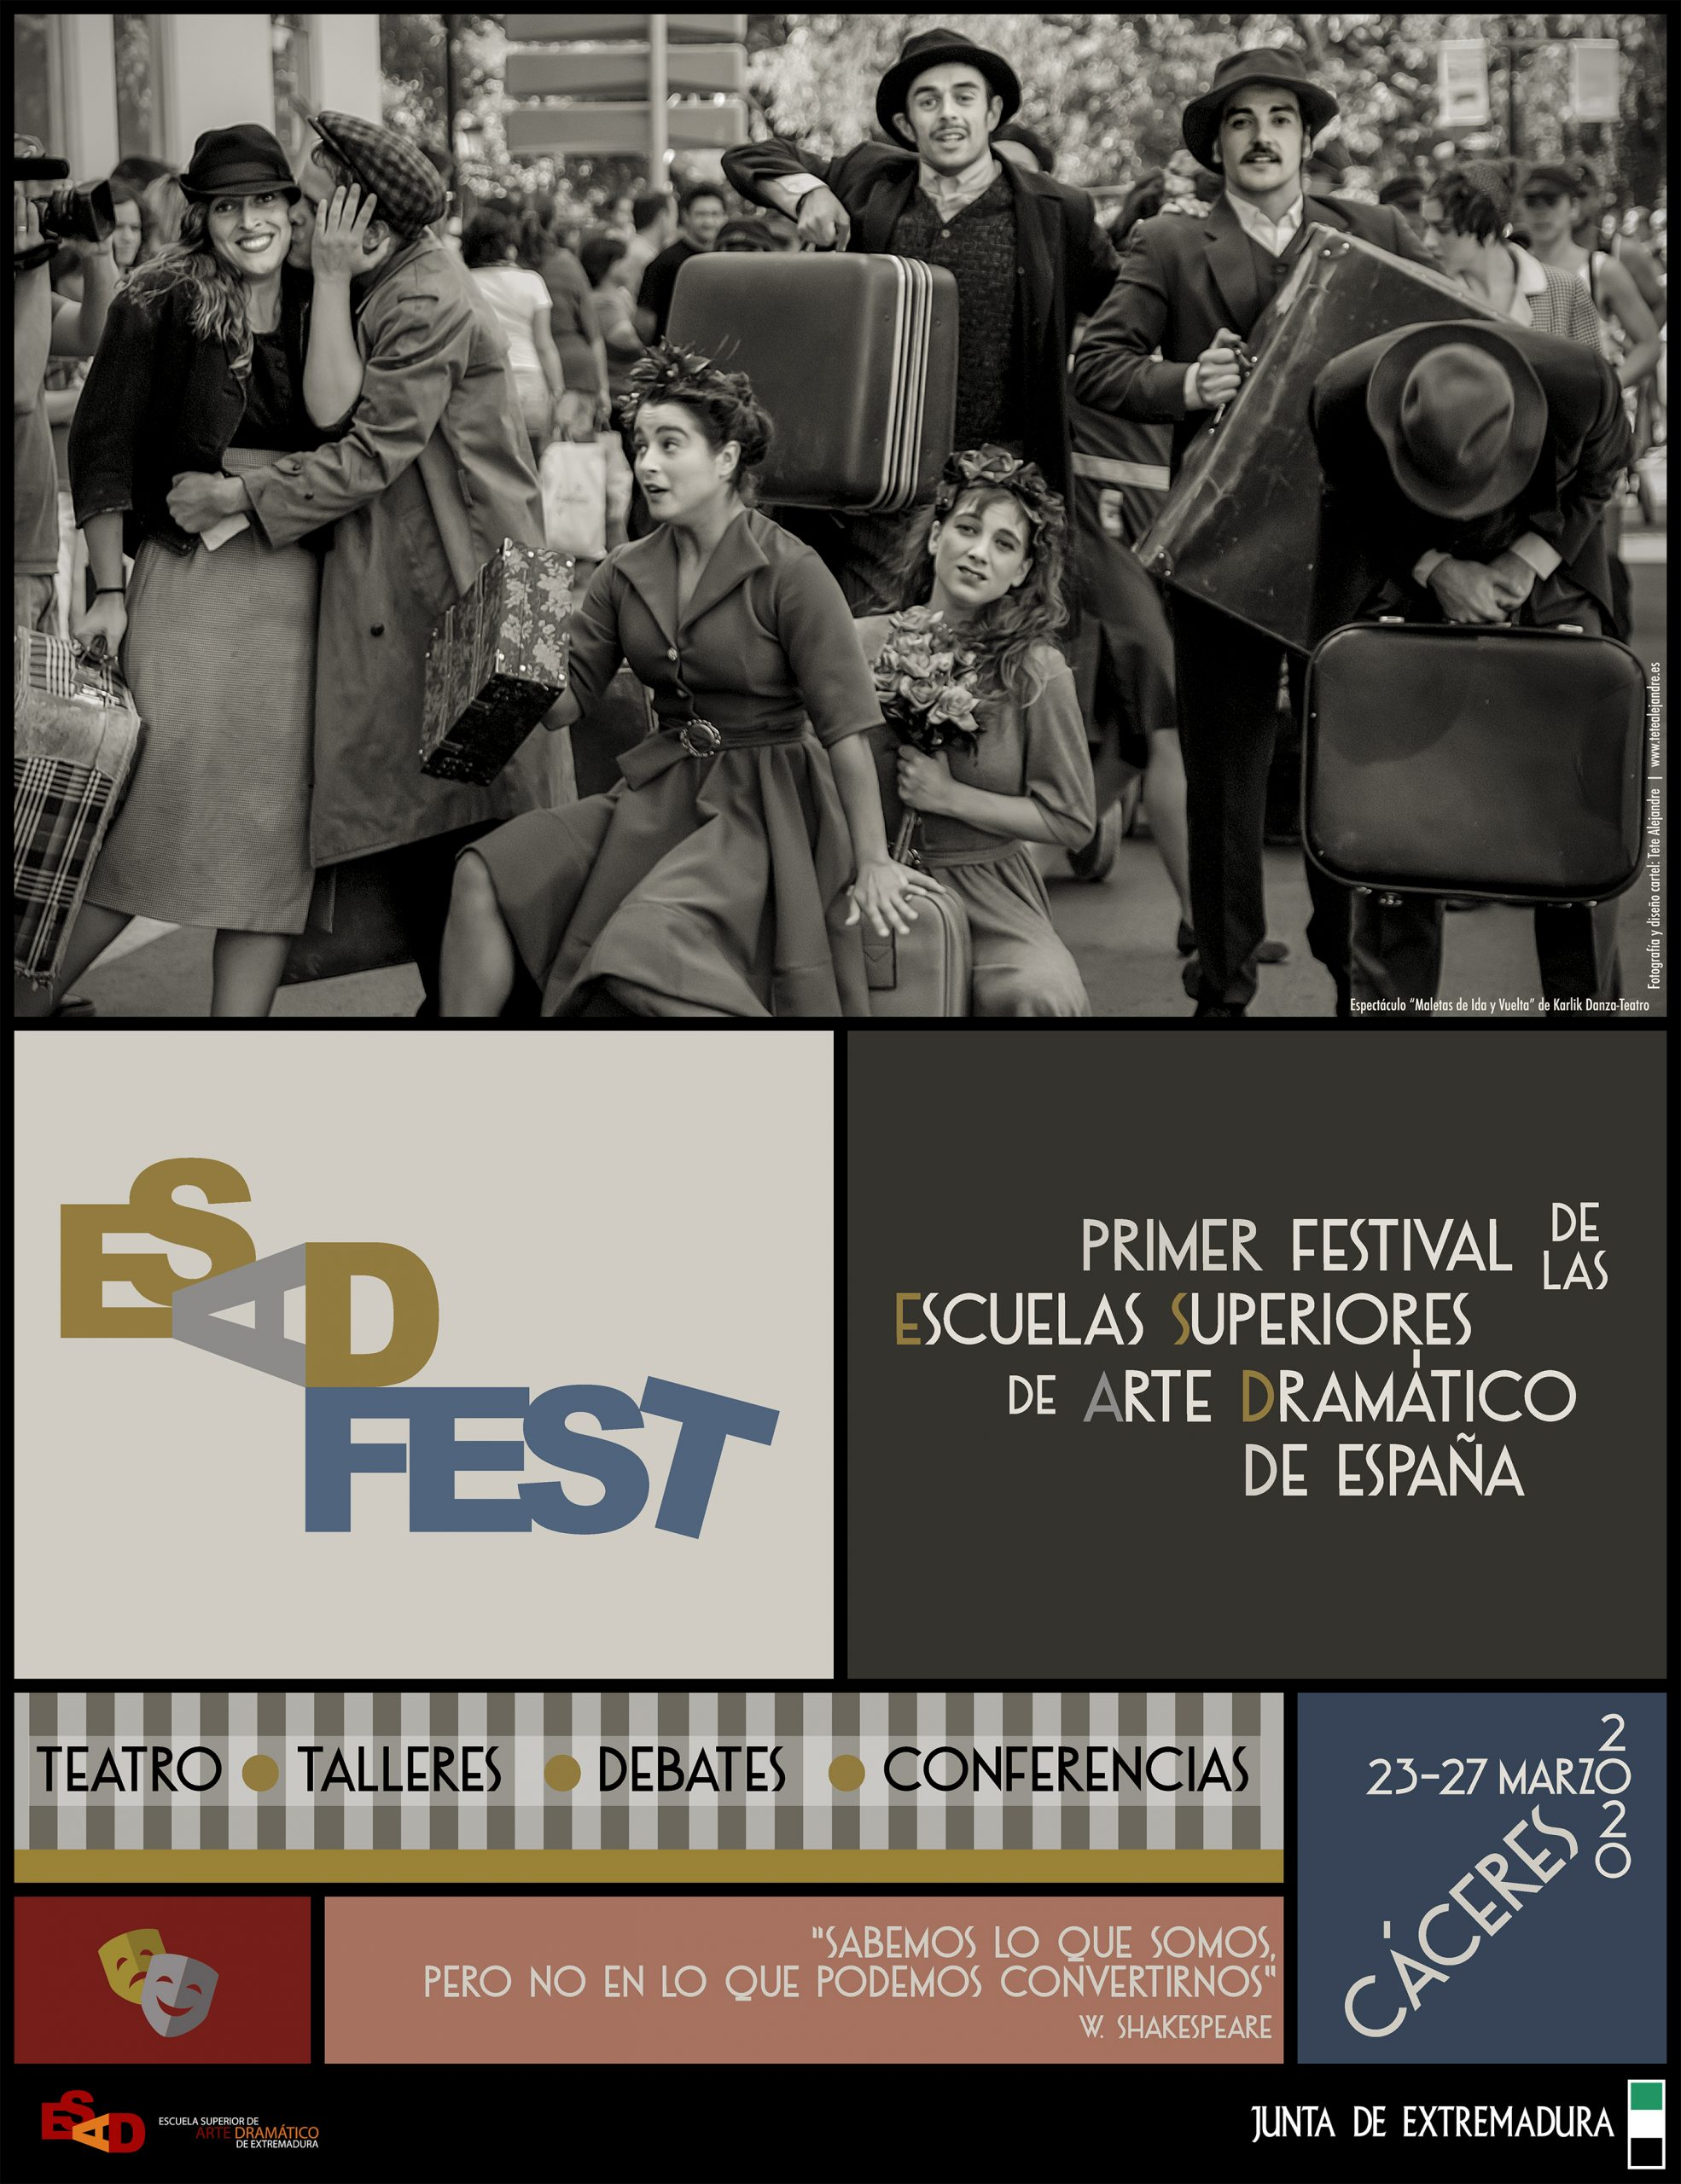 Esad Fest